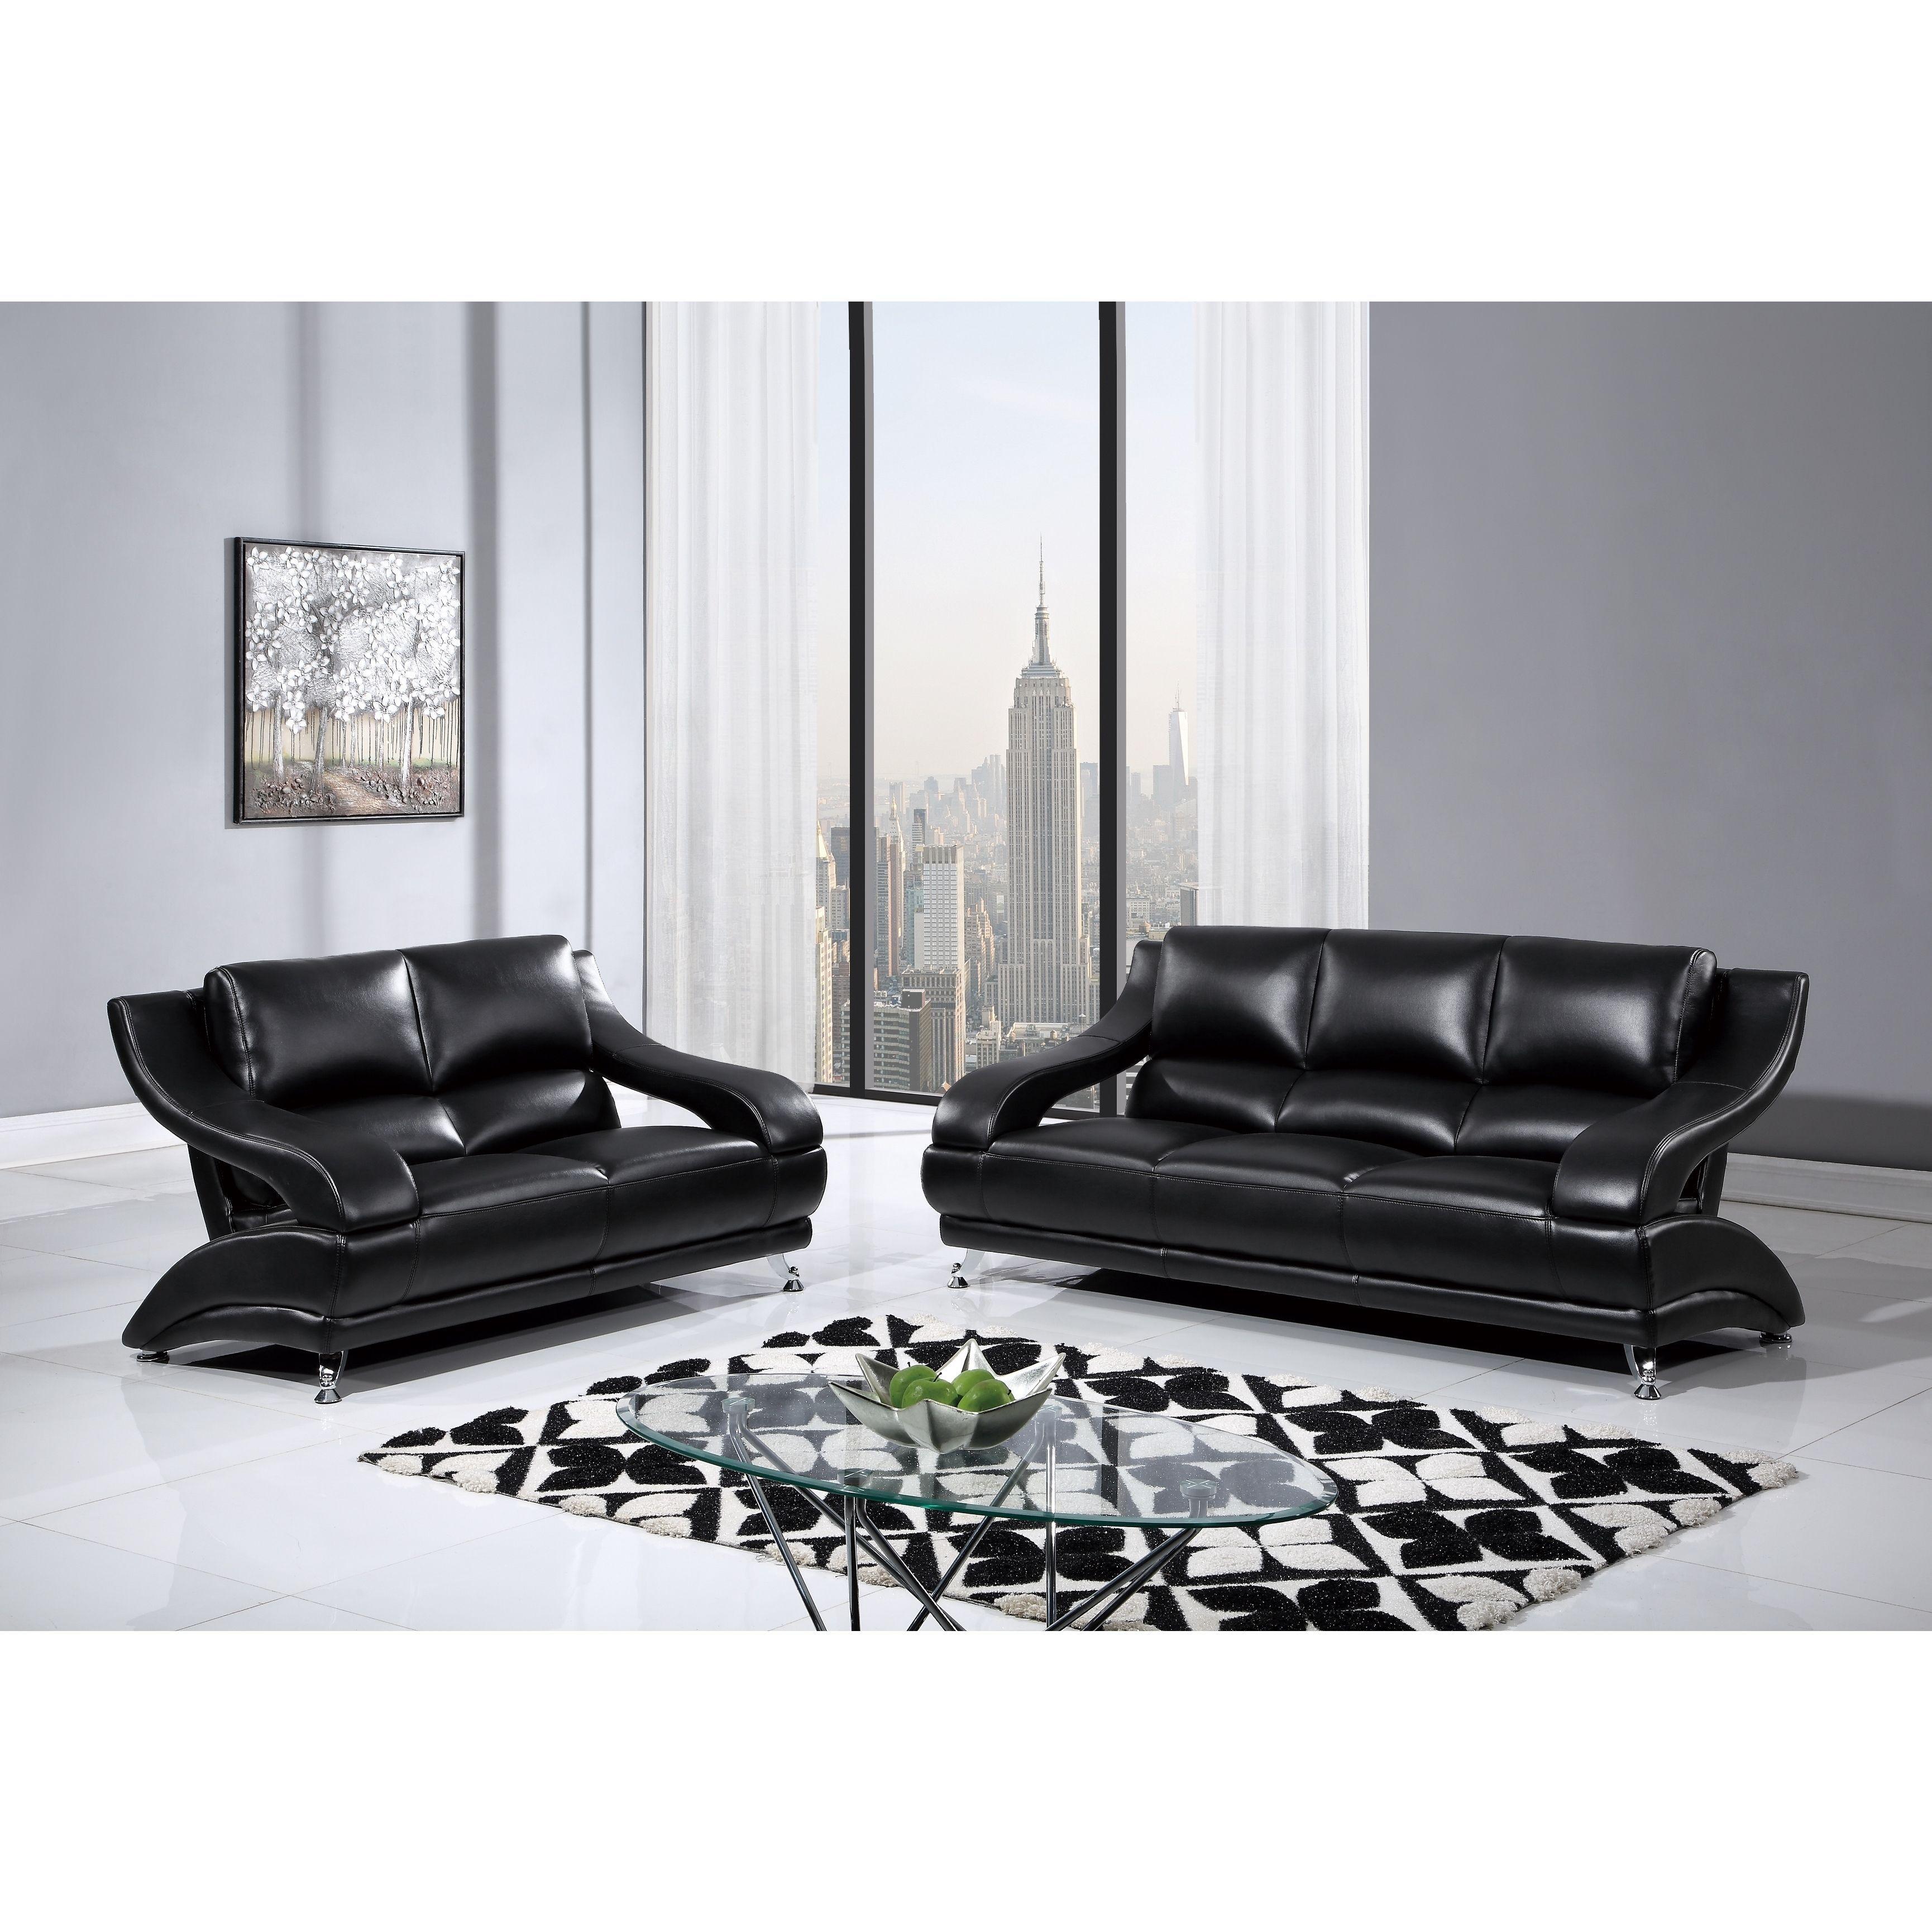 Global Pluto Black Sofa (Sofa Pluto Black) (Plastic) | Products